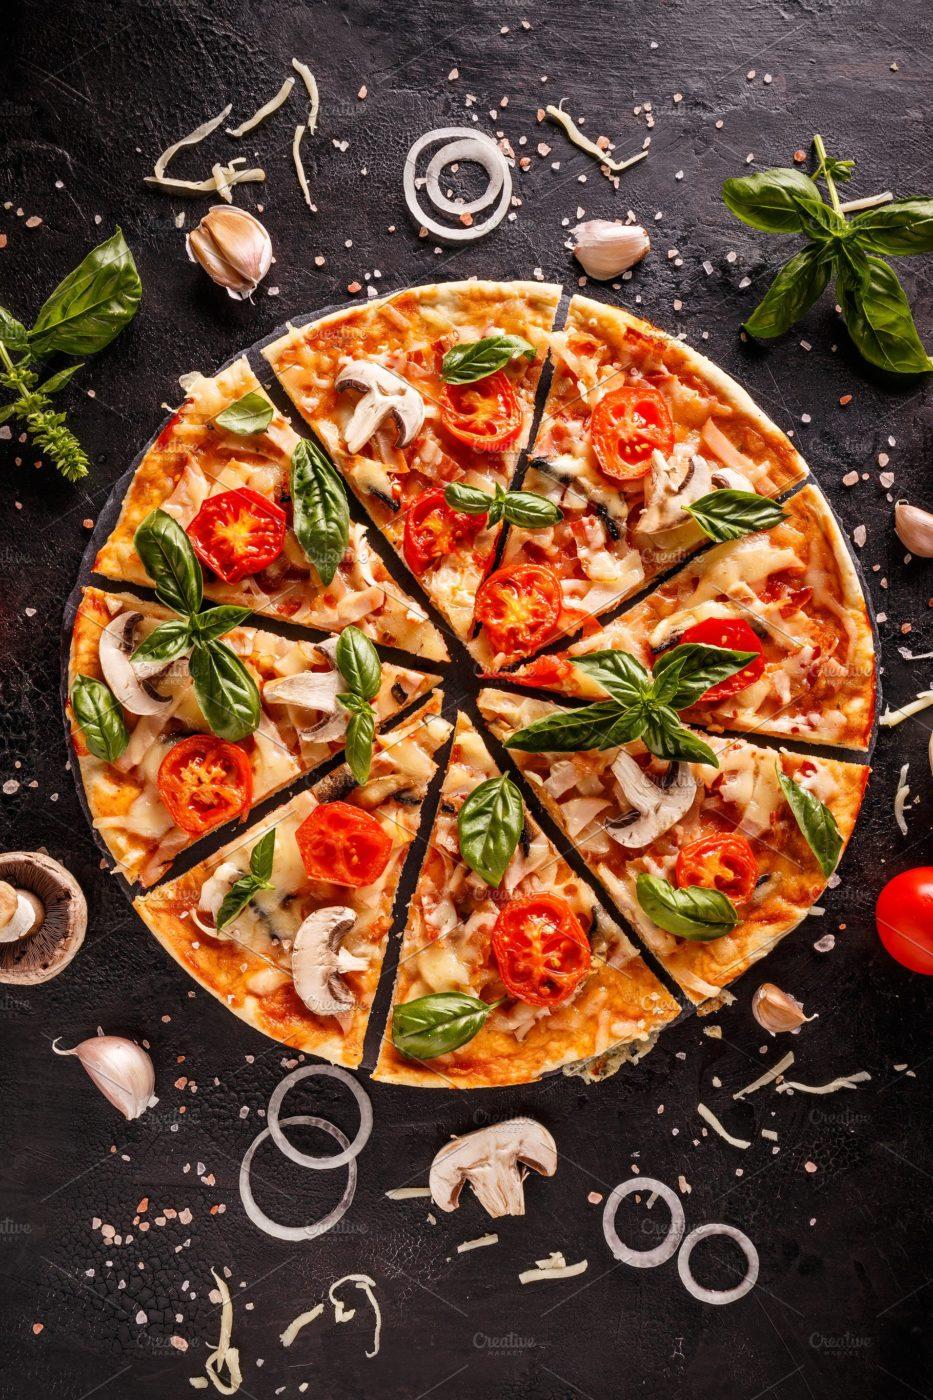 пицца в рок-н-ролл